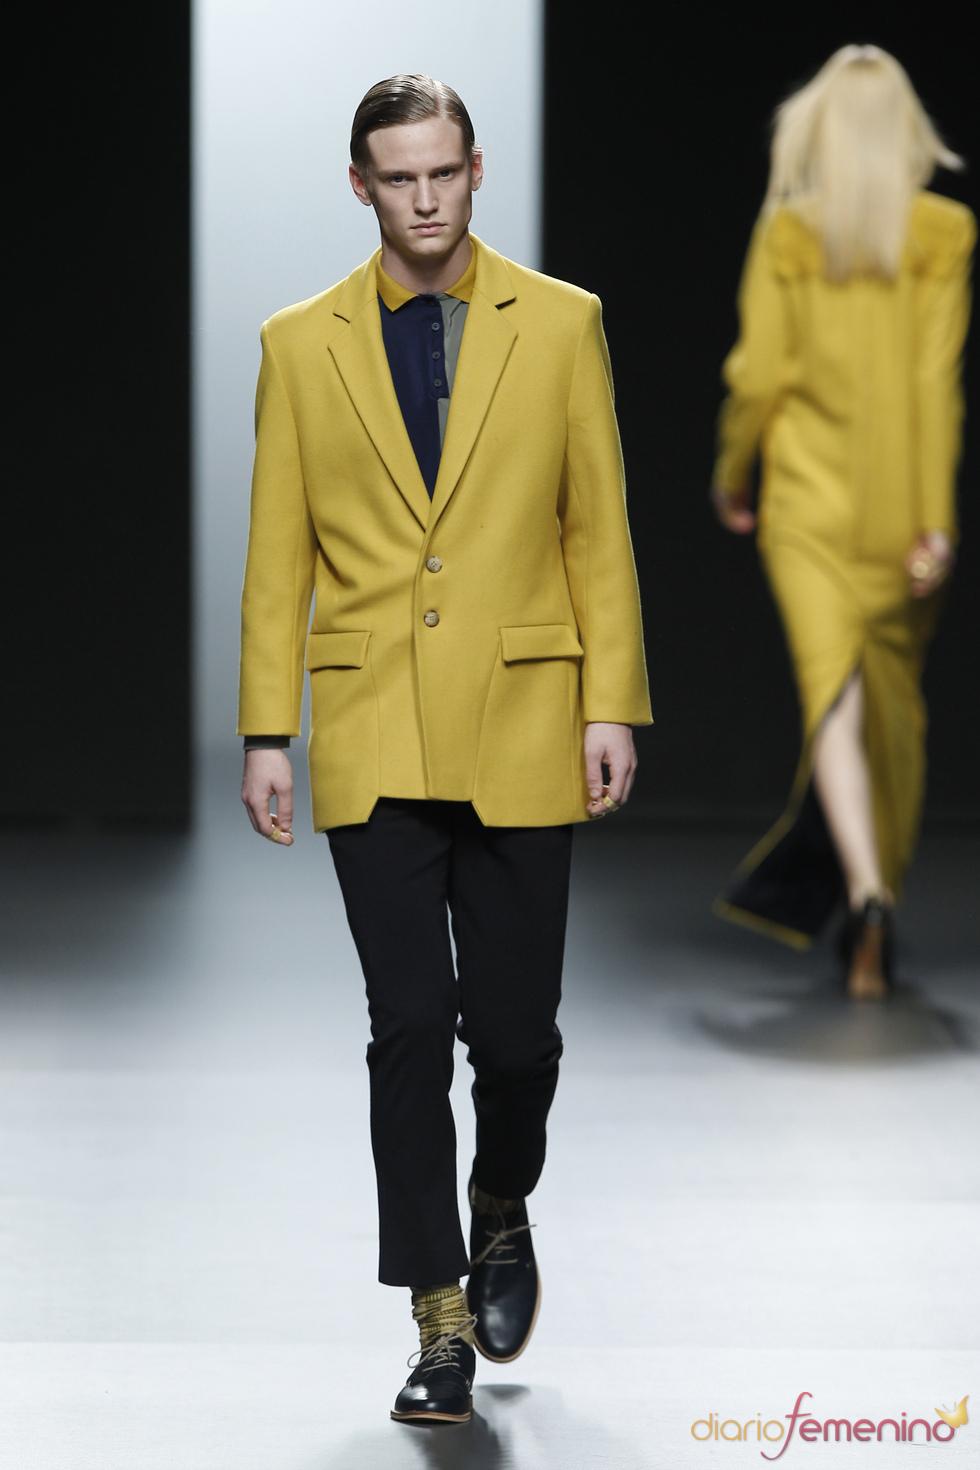 Traje masculino amarillo y negro. Martín Lamothe. Cibeles Madrid Fashion Week 2011